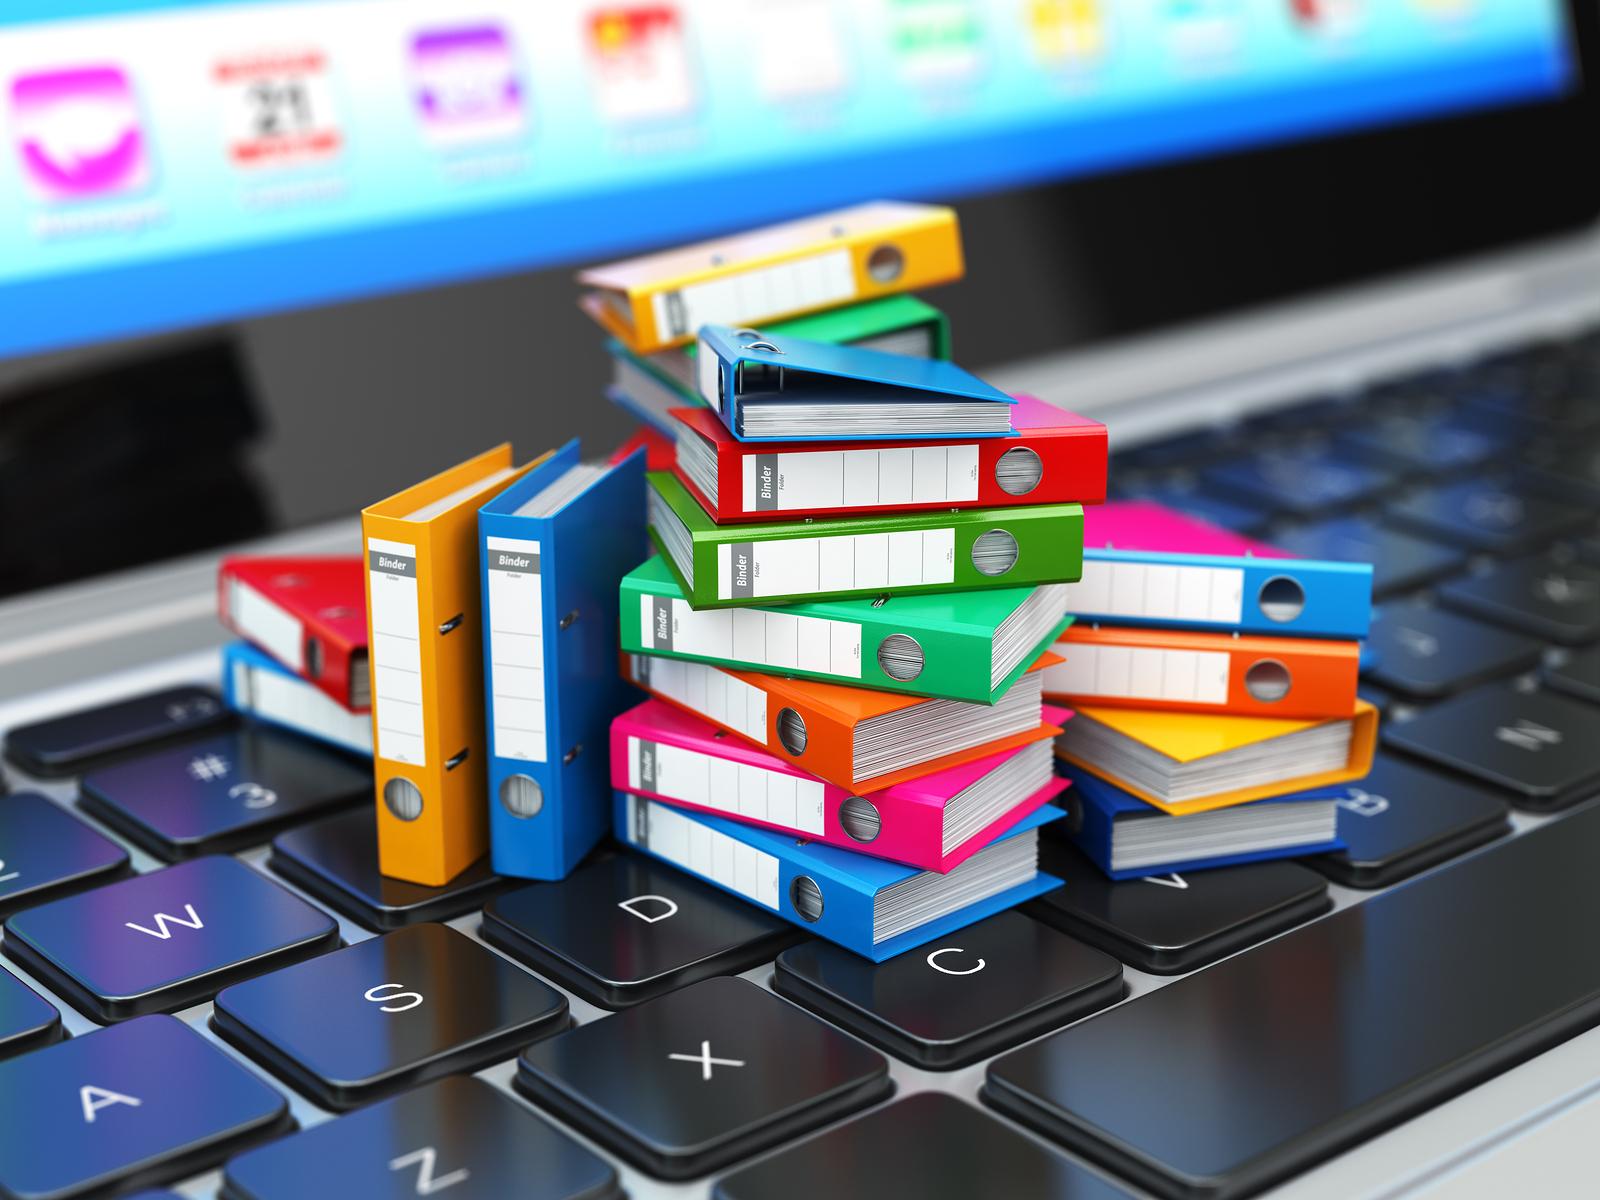 Tiny three-ring binders sitting on a computer keyboard.